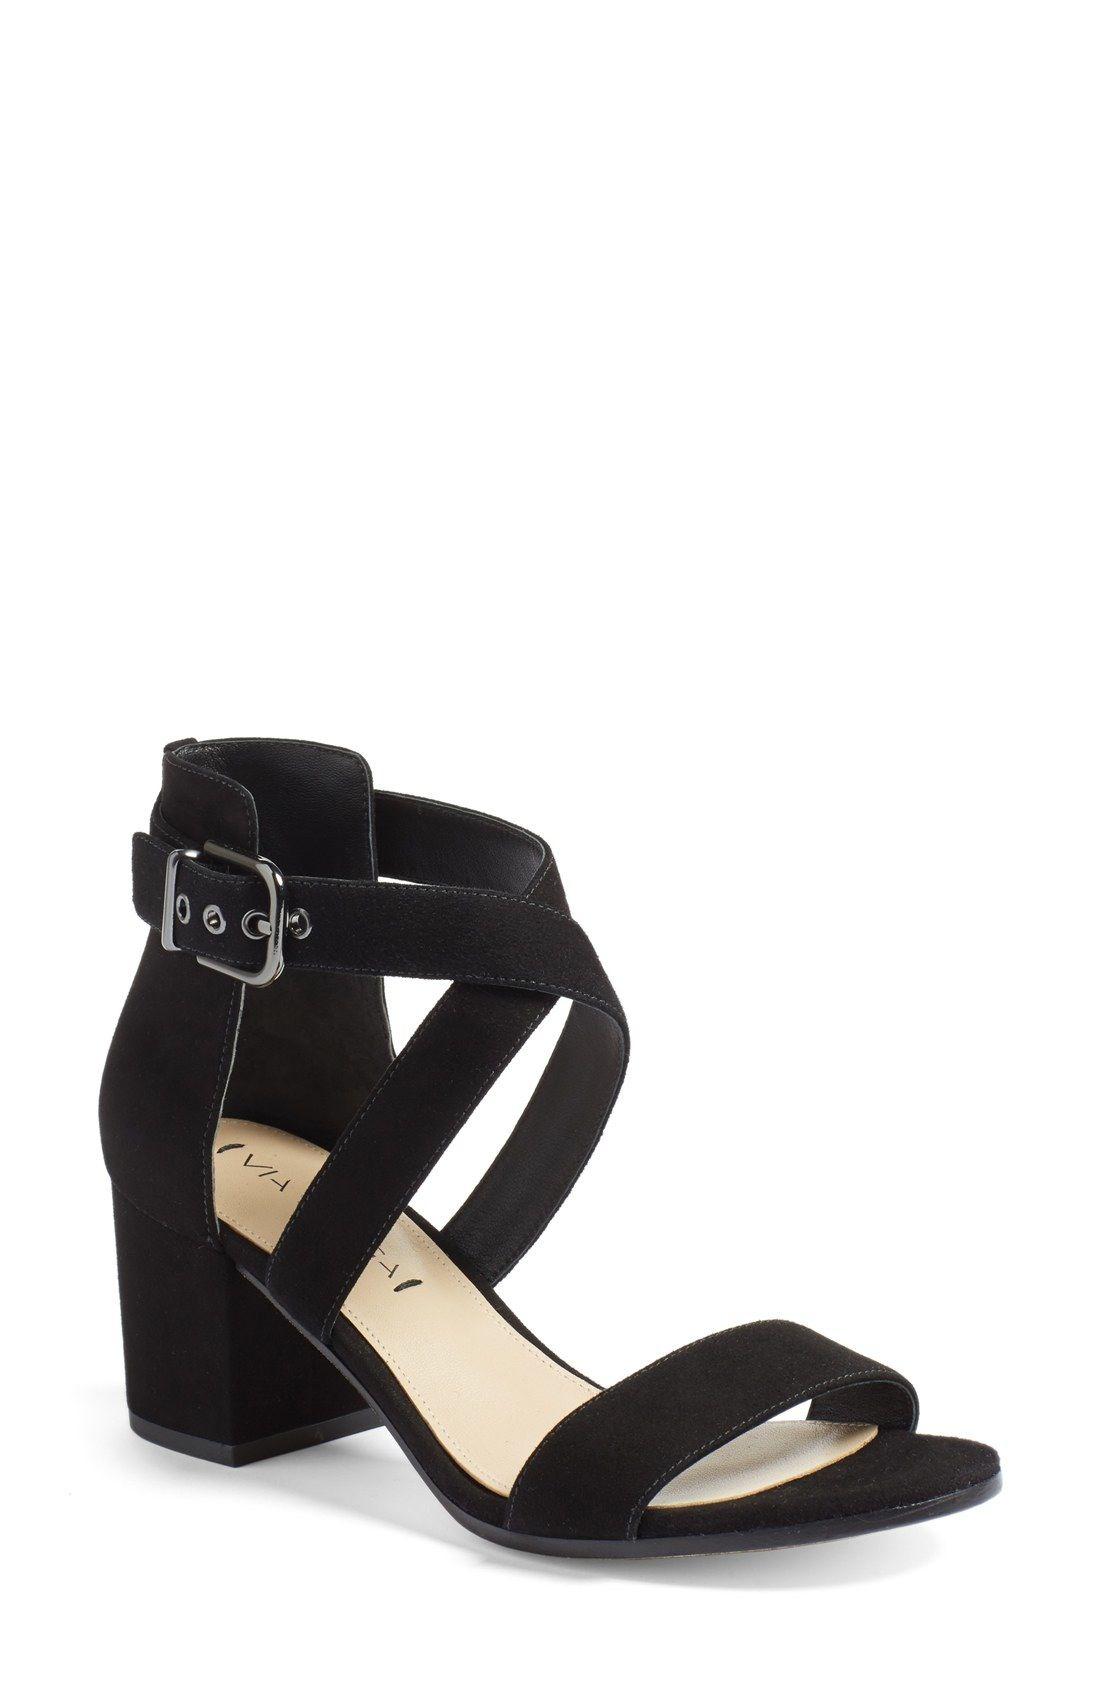 425bc9e5550 Via Spiga  Jobina  Crisscross Strap Block Heel Sandal (Women) available at   Nordstrom